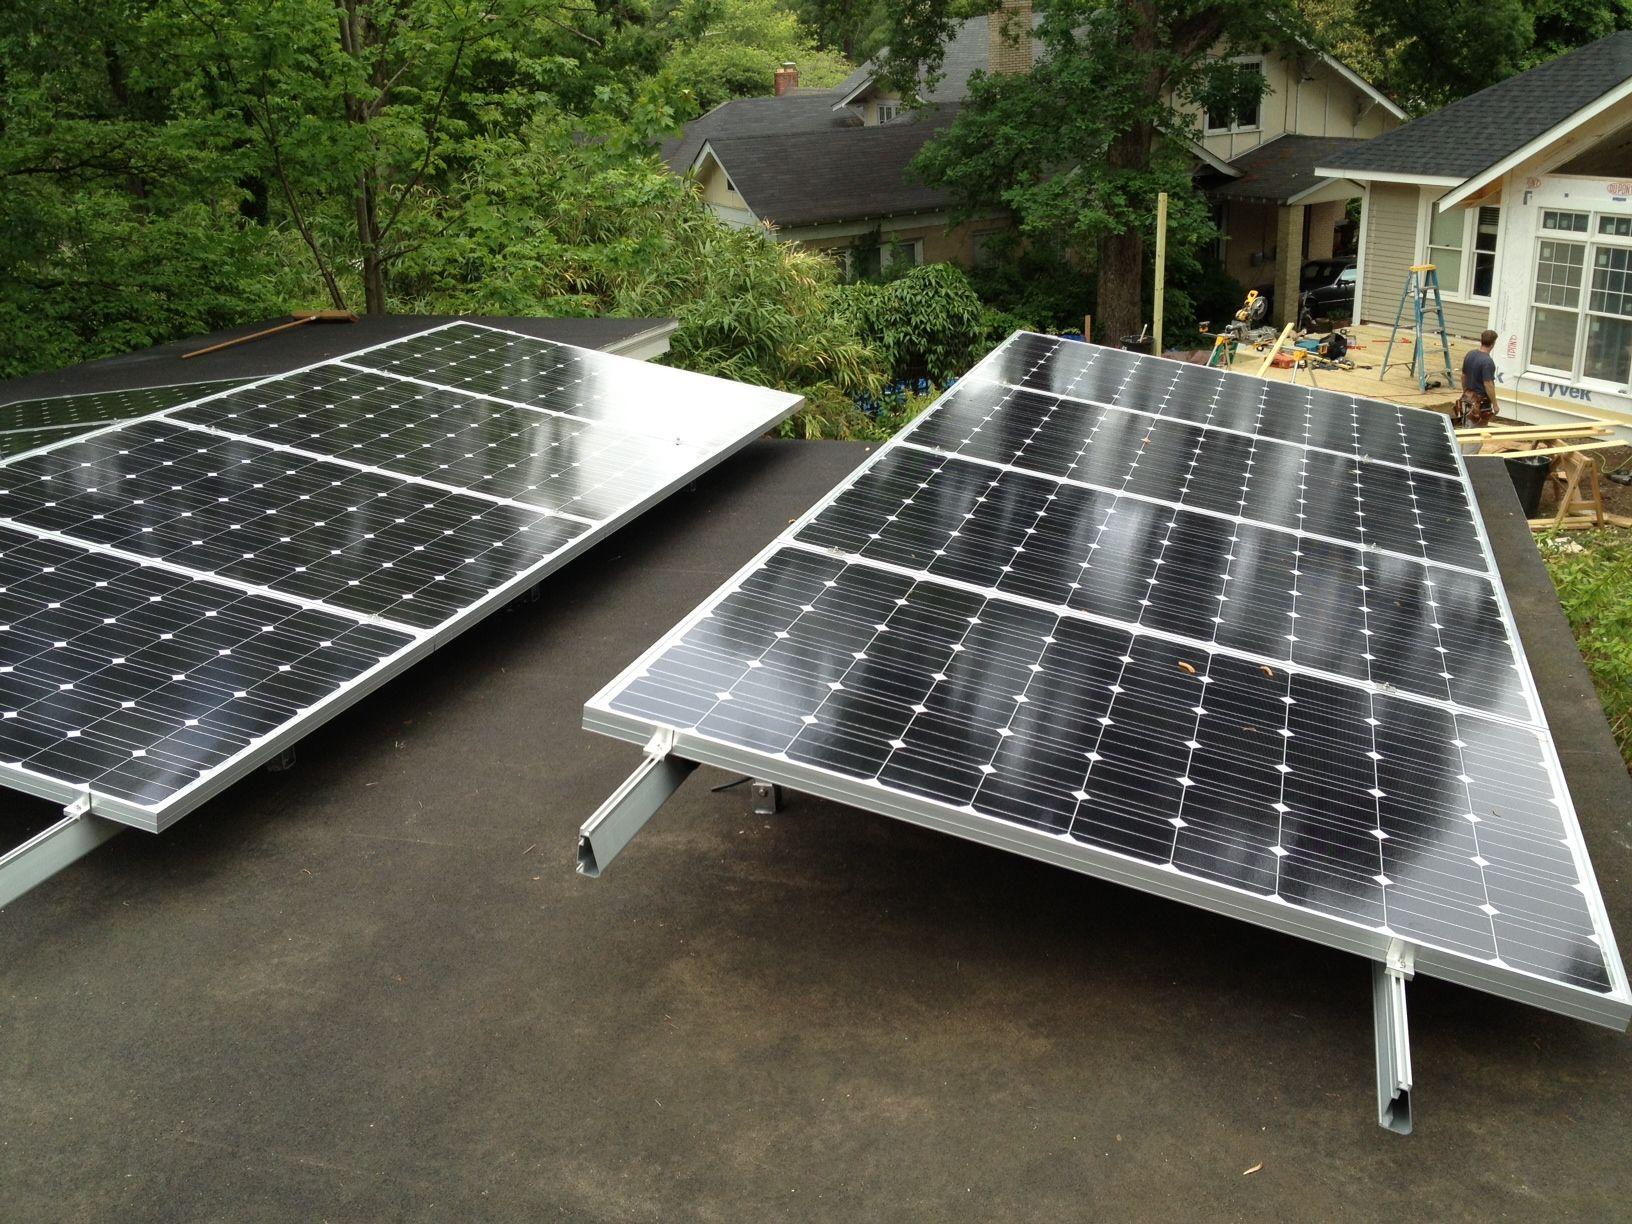 decatur georgia solar carport solar for the home pinterest. Black Bedroom Furniture Sets. Home Design Ideas